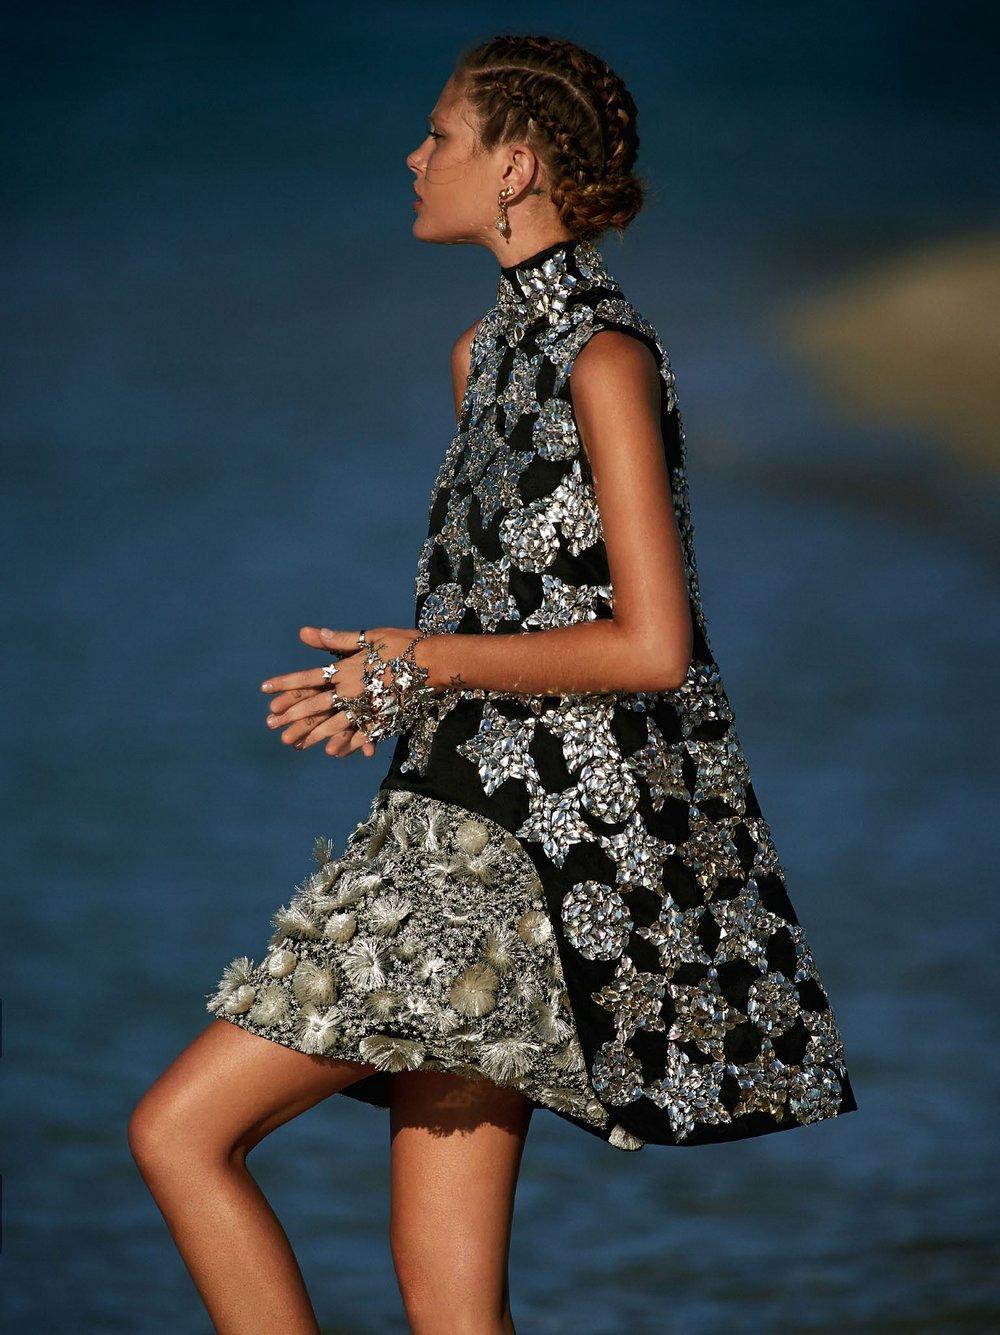 Catherine-McNeil-by-Gilles-Bensimon-for-Vogue-Australia-October-2014-1.jpg